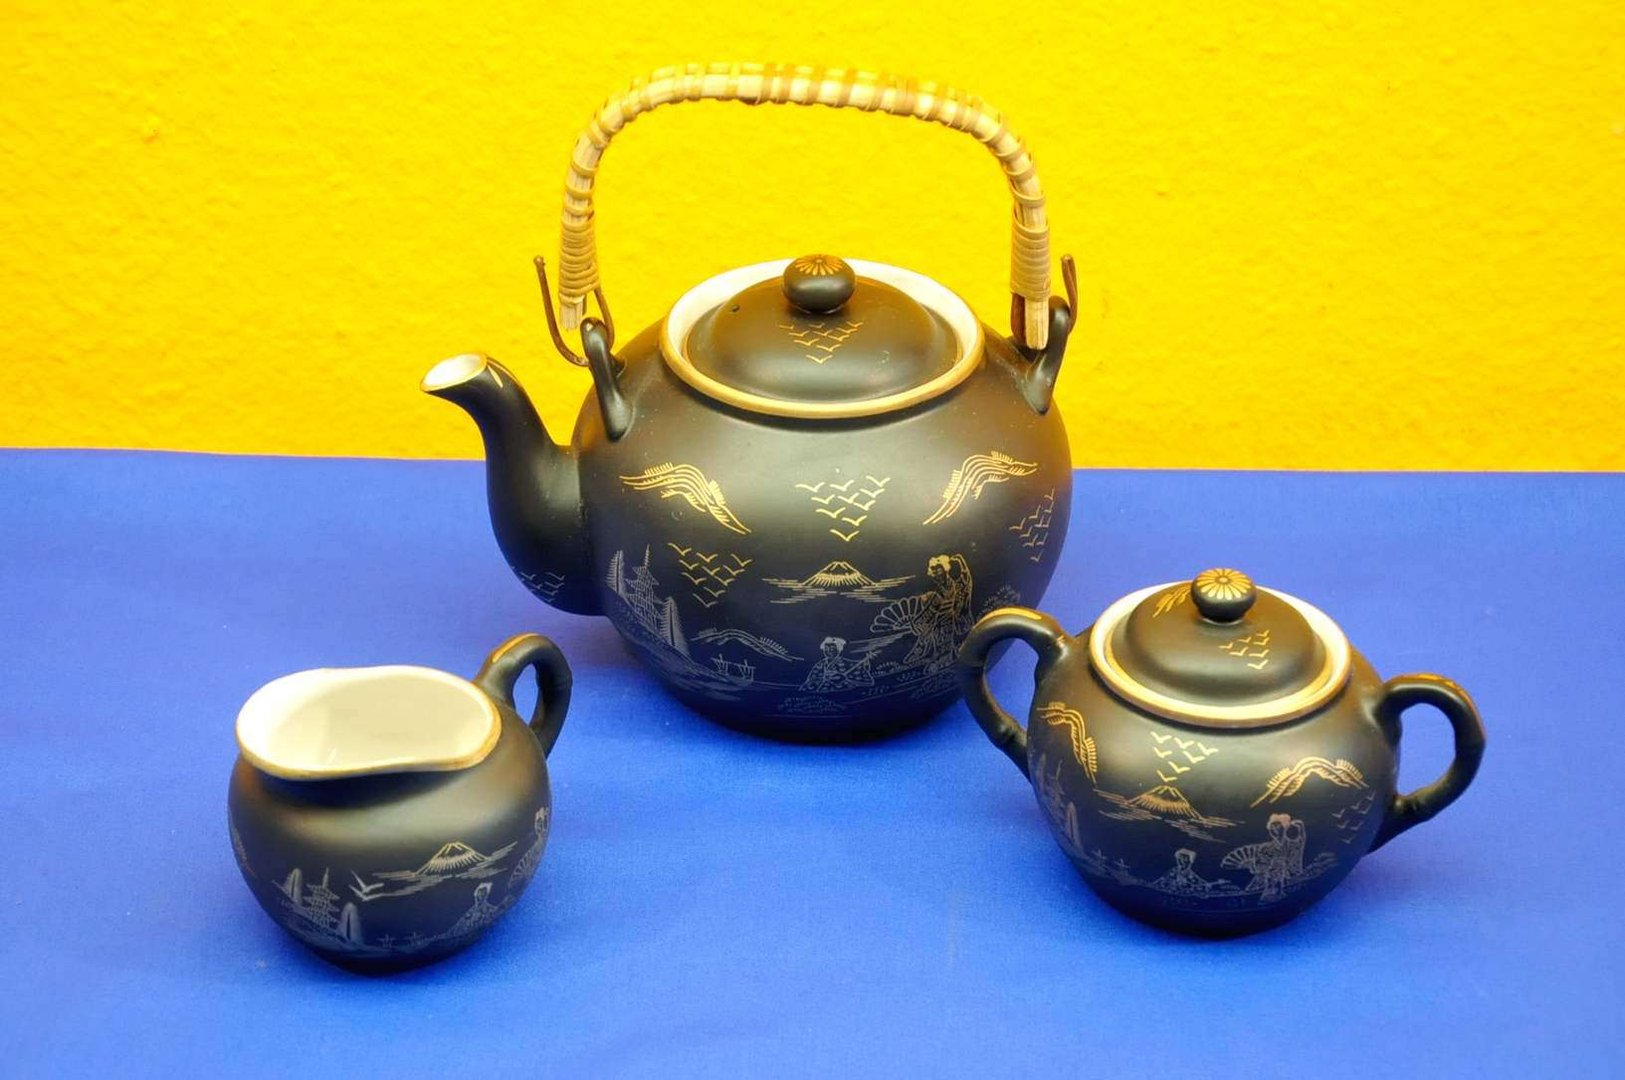 sunny china porzellan tee set schwarz gold bestellen bei kusera. Black Bedroom Furniture Sets. Home Design Ideas